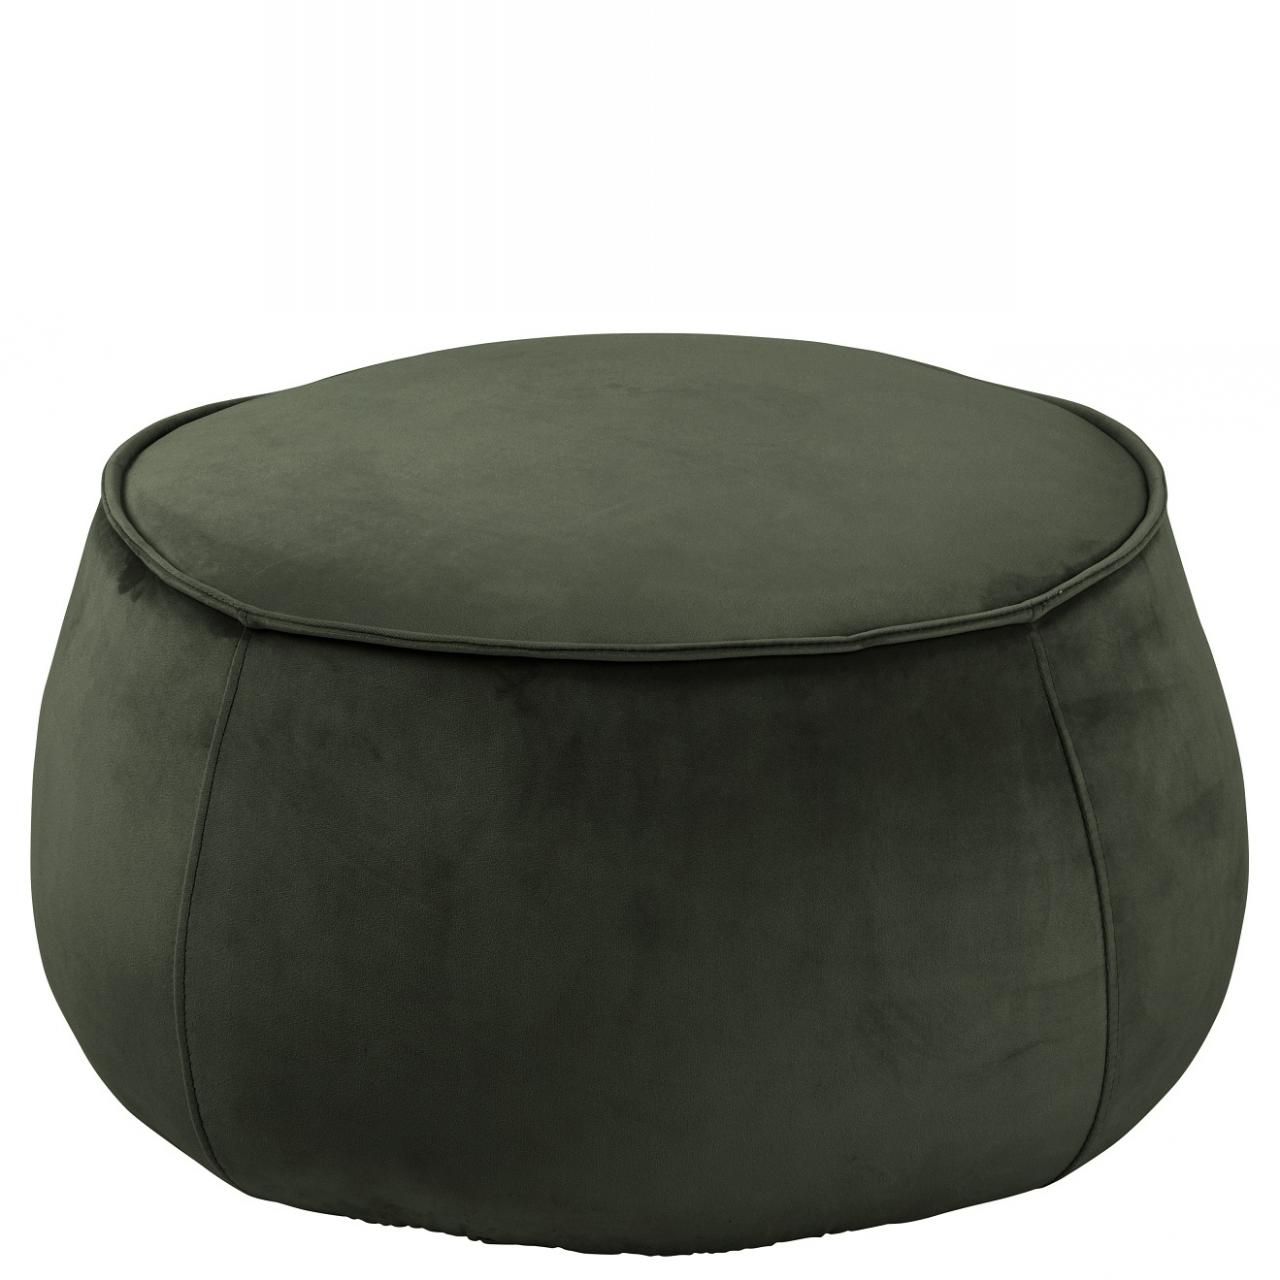 Hocker Mie VIC Stoff Dunkelgrün Sitzhocker Sitzkissen Polsterhocker